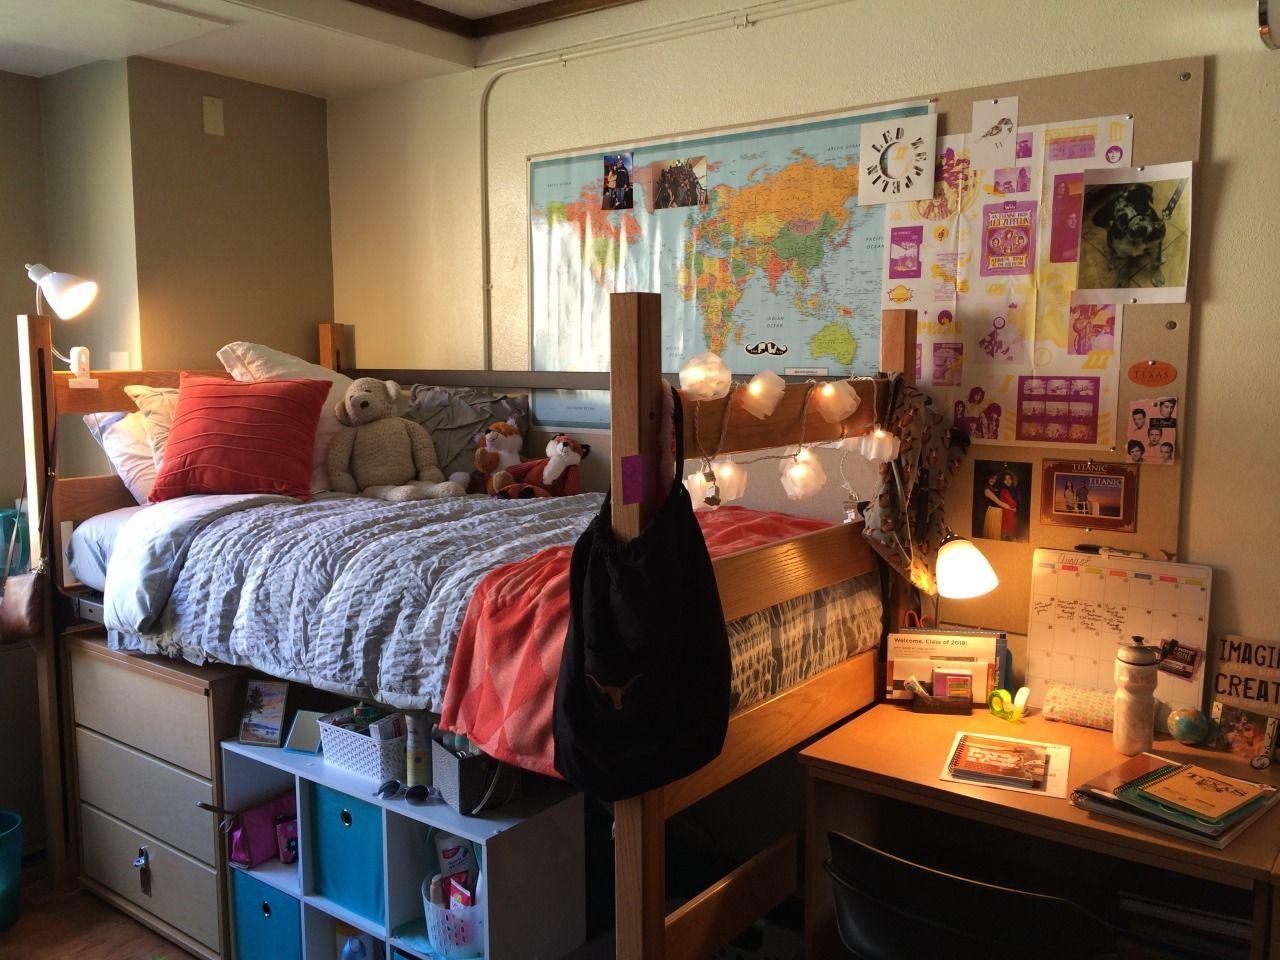 University of Texas at Austin, Moore Hill Cool dorm